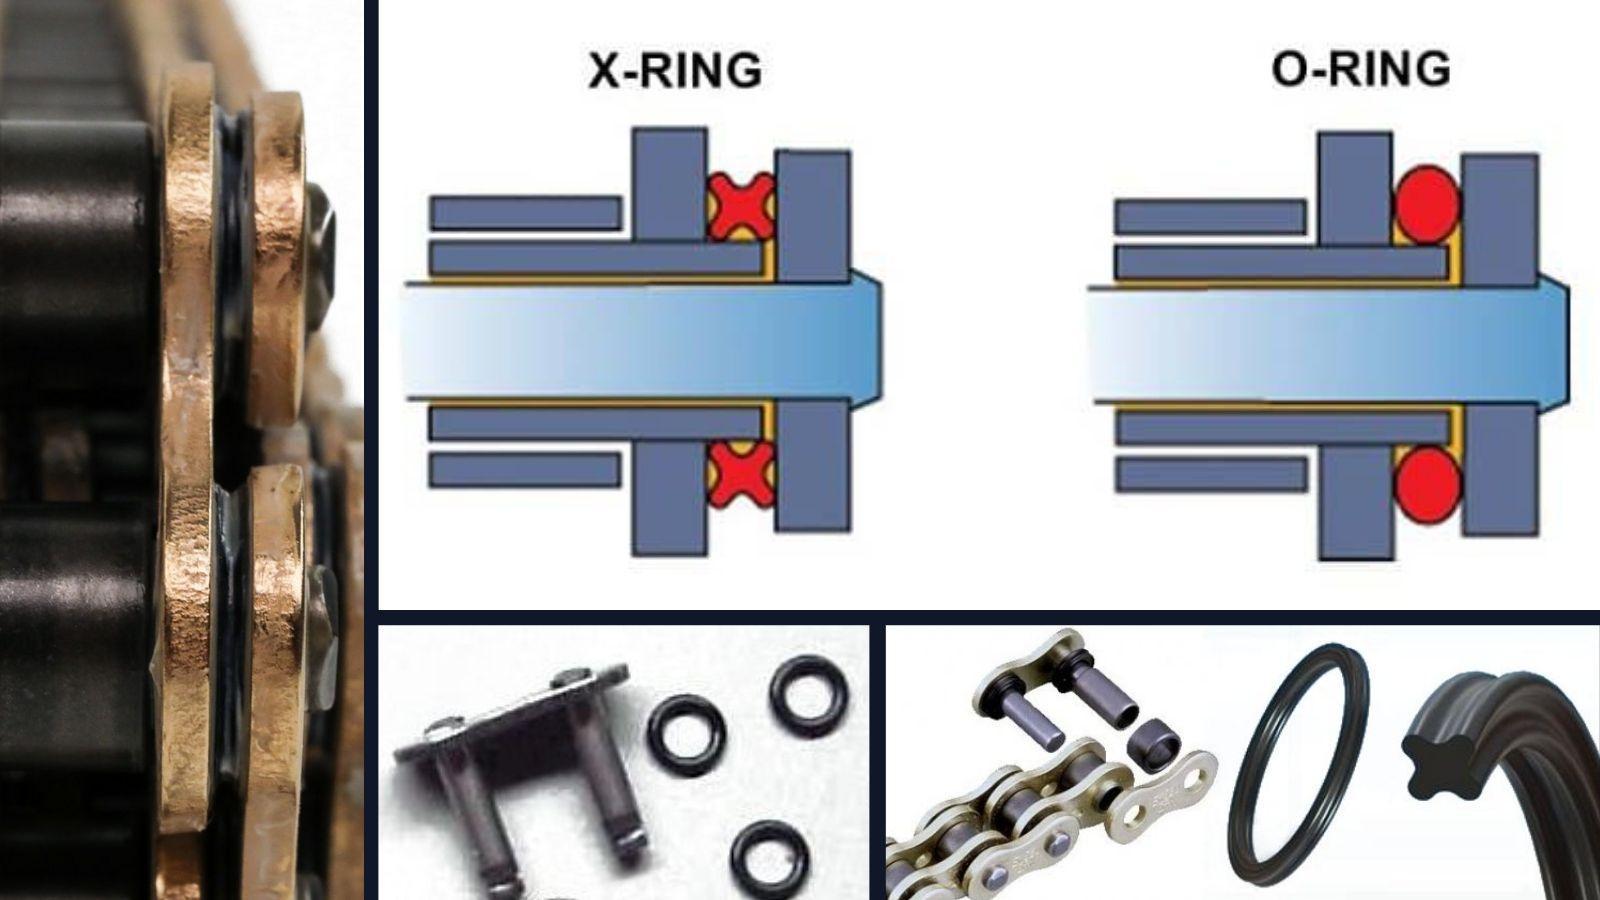 Zincir: O-Ring ve X-Ring nedir?